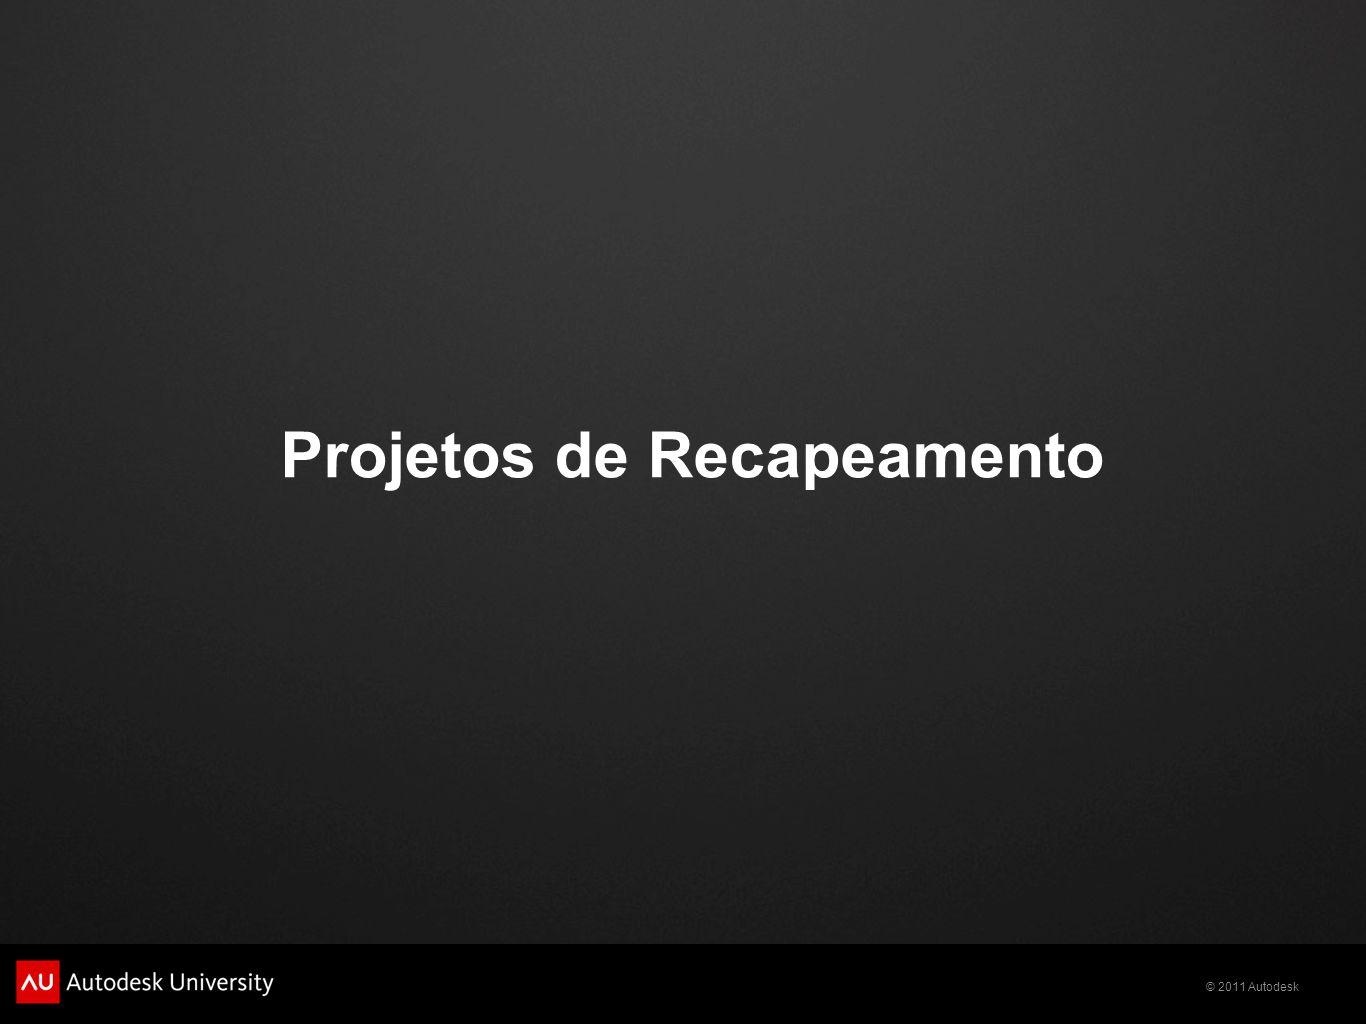 Projetos de Recapeamento